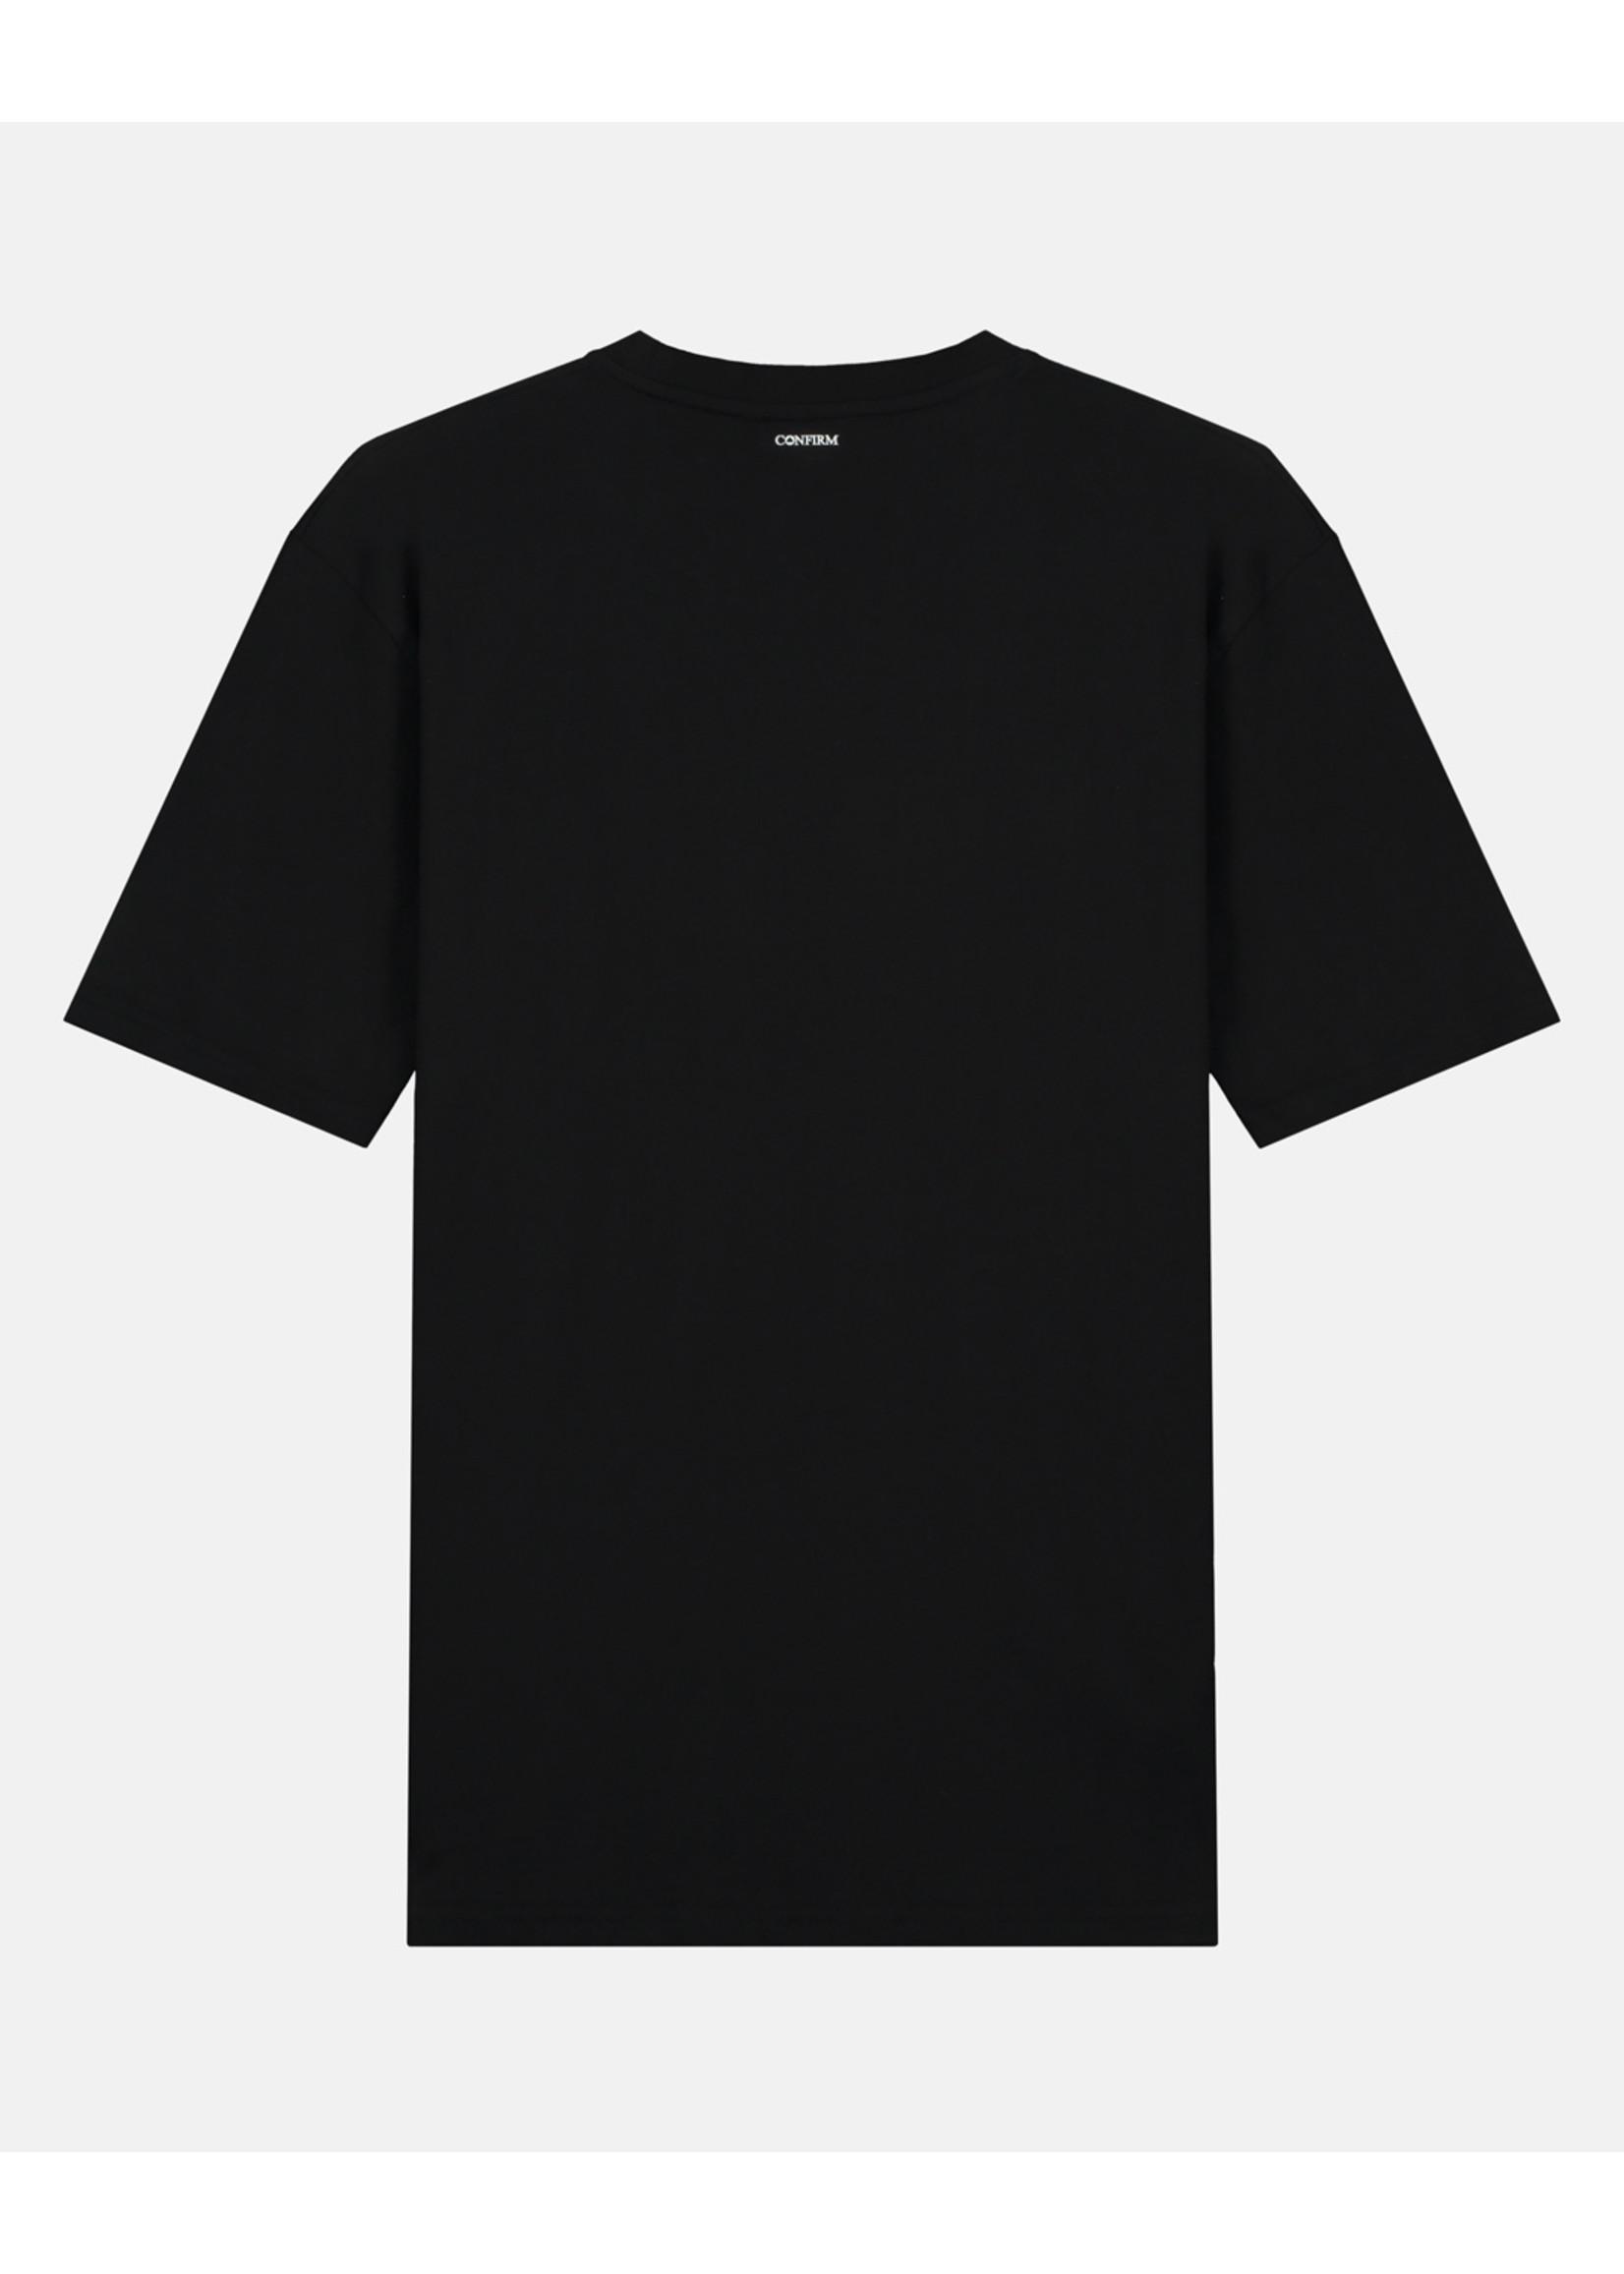 Confirm brand T-shirt identity - neon pink